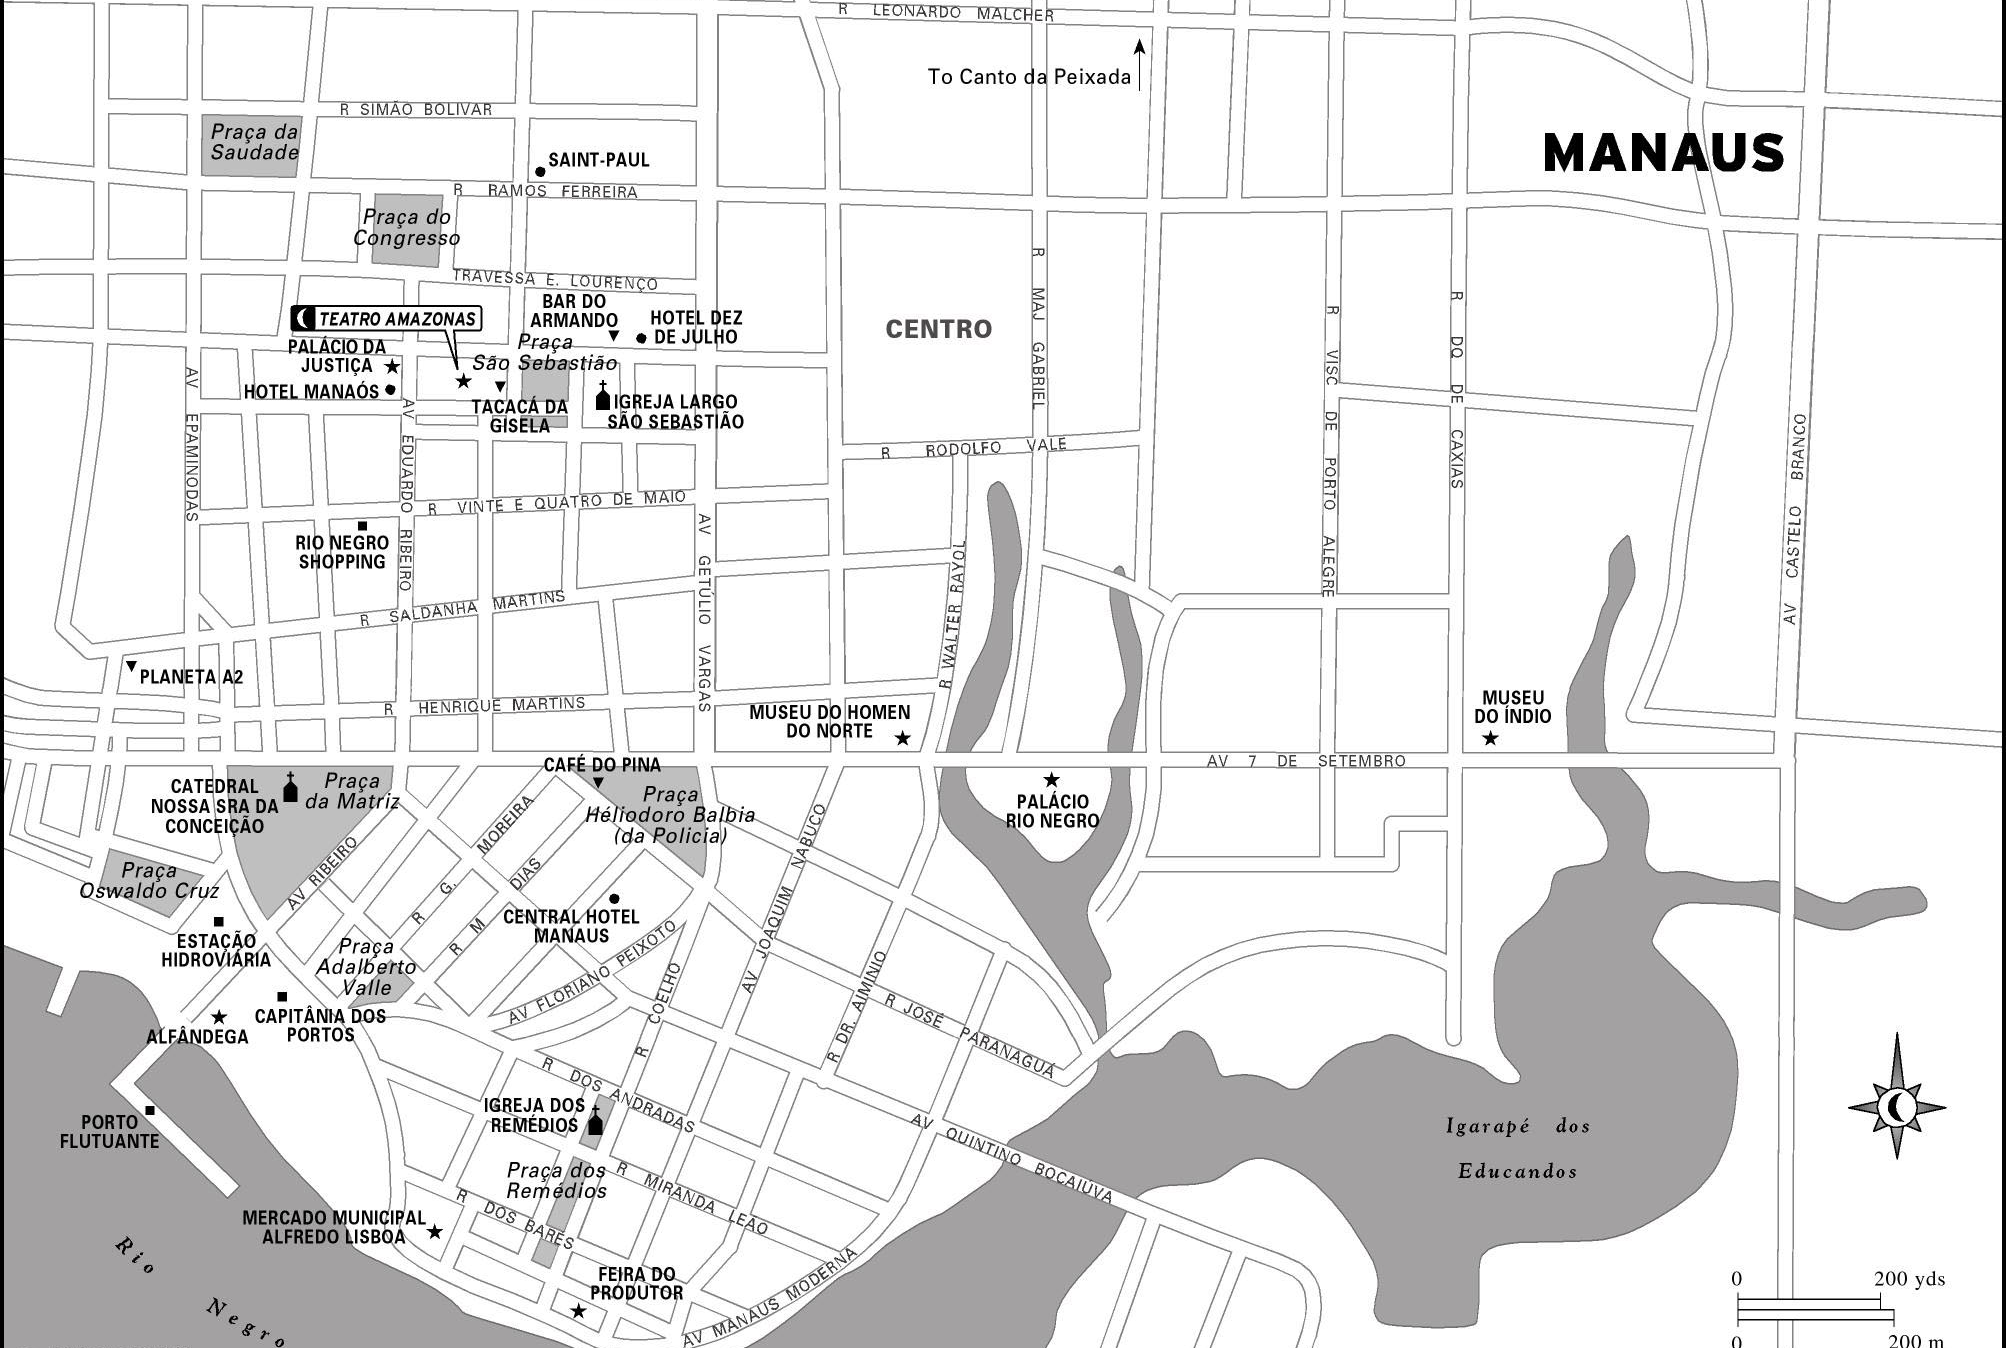 Map of Manaus (ph. moon.com)